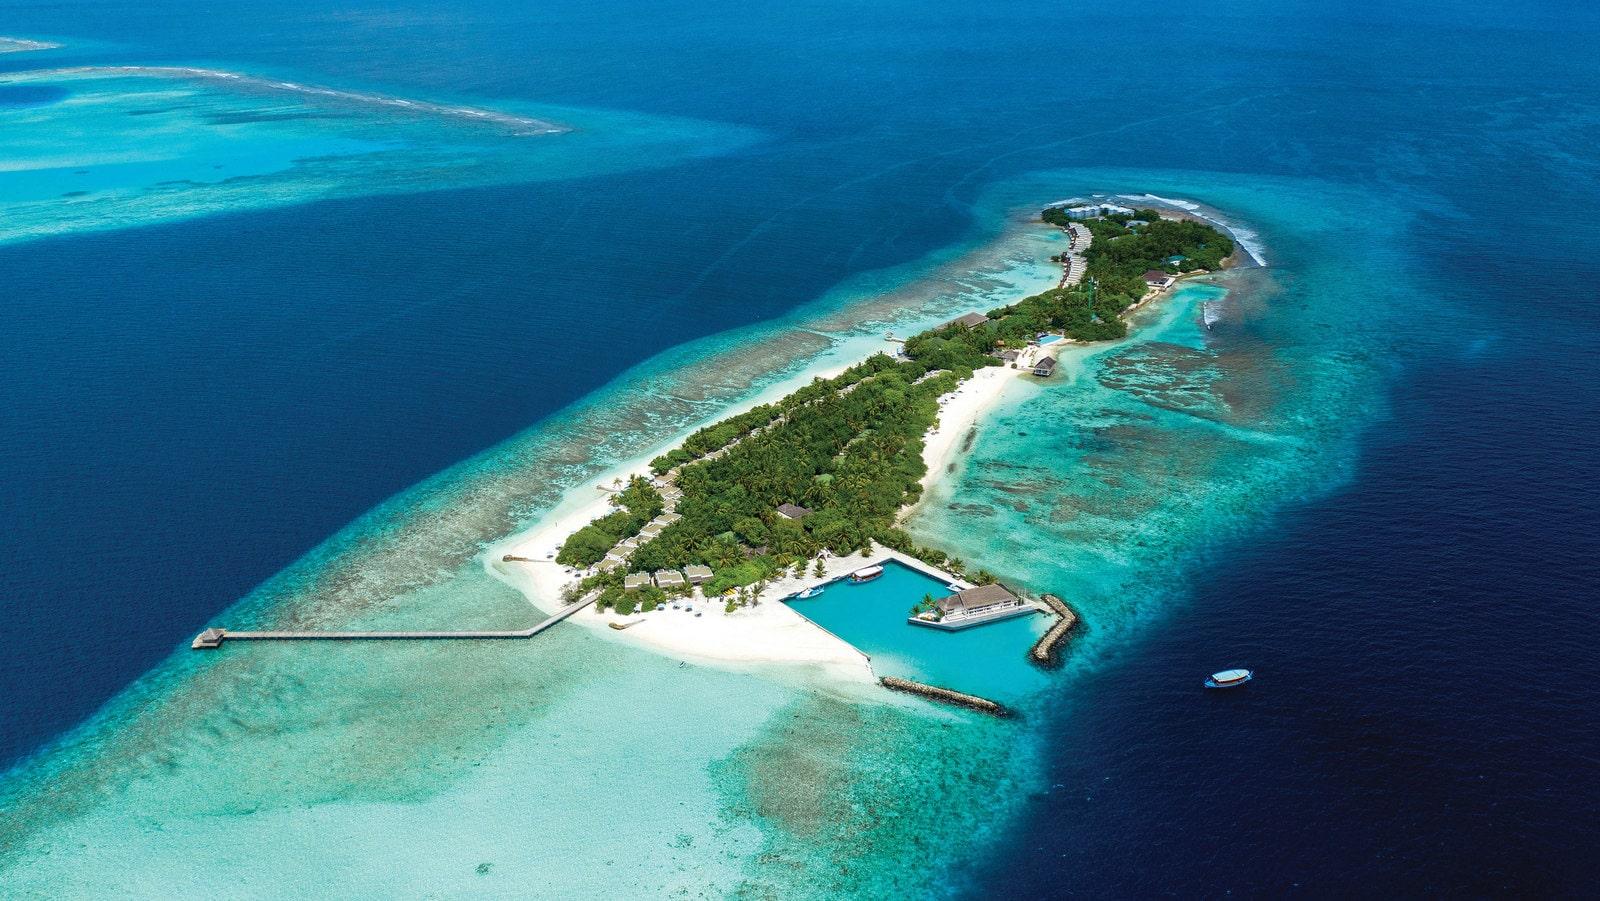 Мальдивы, отель OBLU by Atmosphere at Helengeli